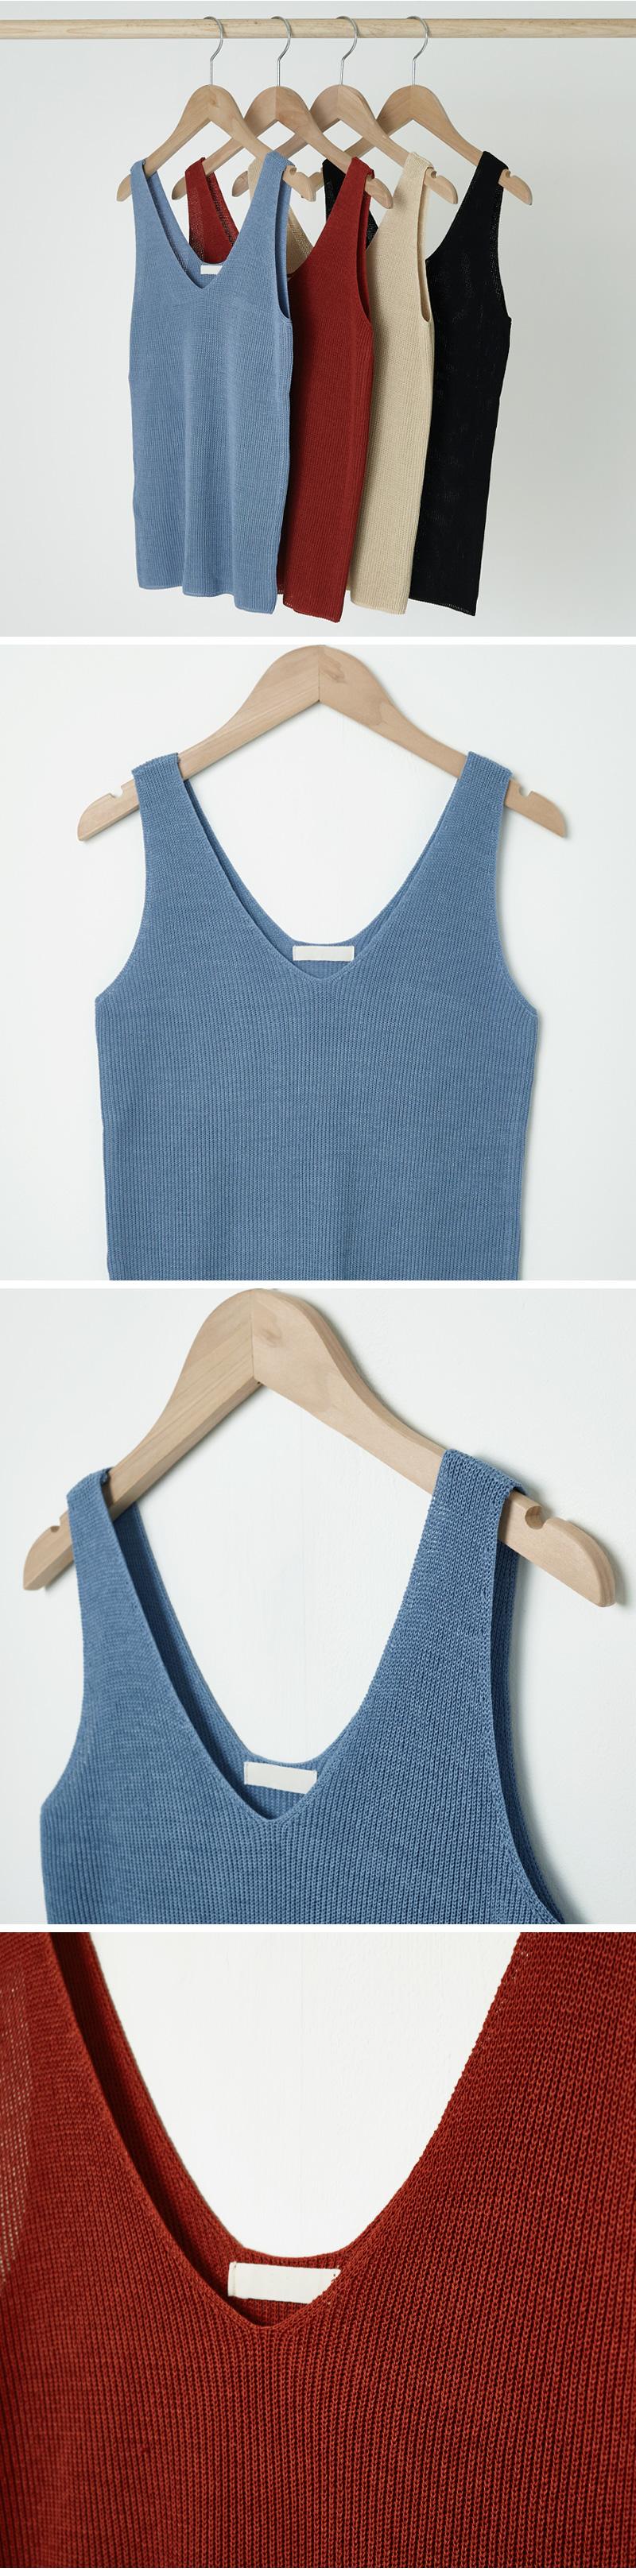 Cool V Neck Knitwear Sleeveless